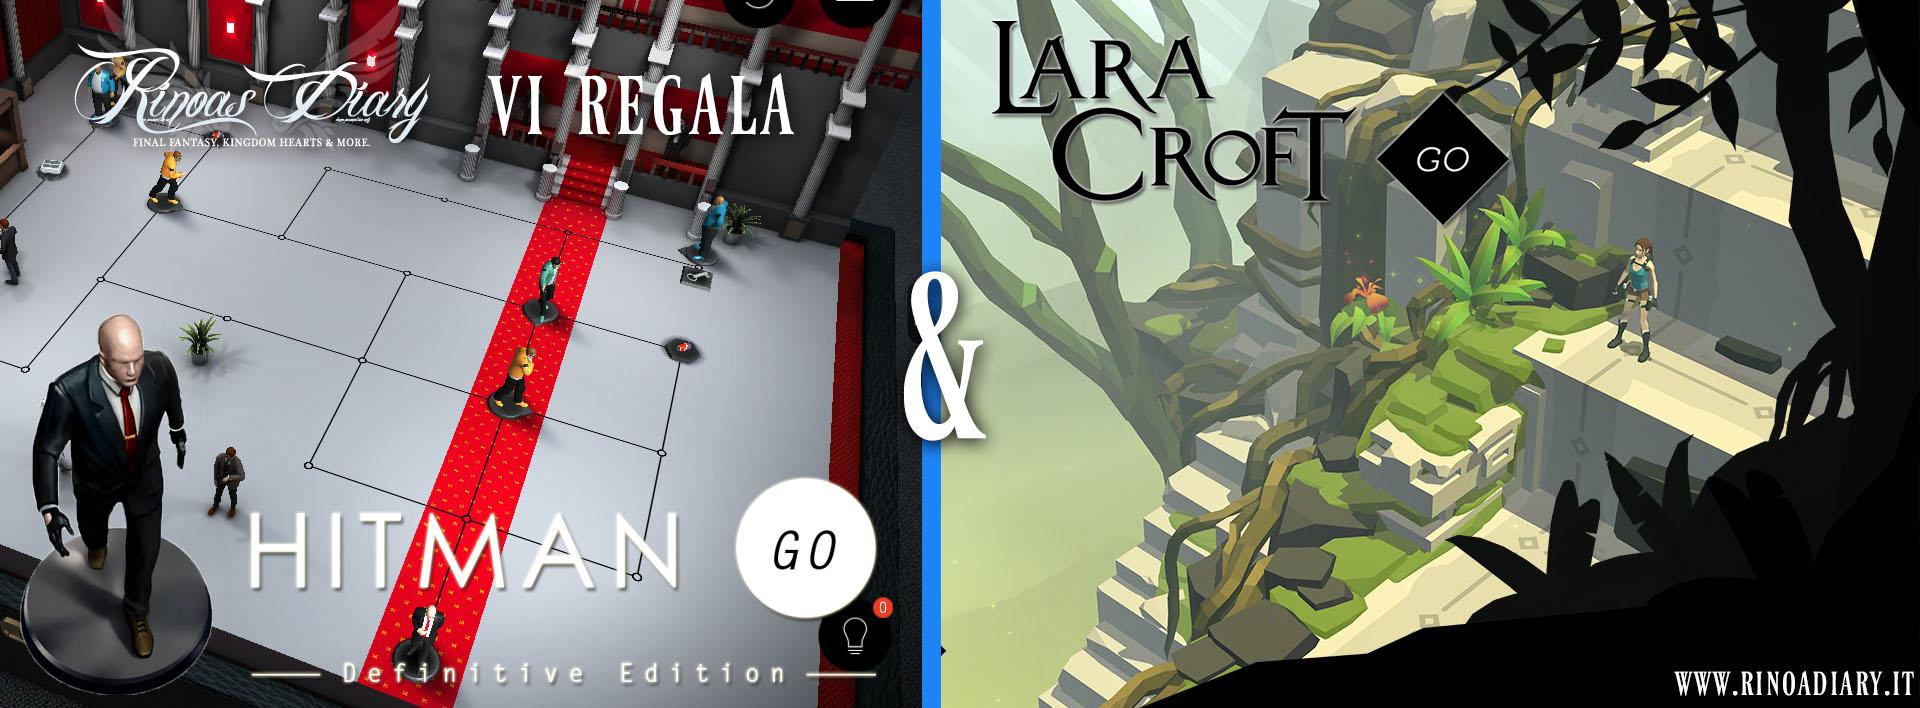 Rinoa's Diary vi regala Hitman GO e Lara Croft GO!